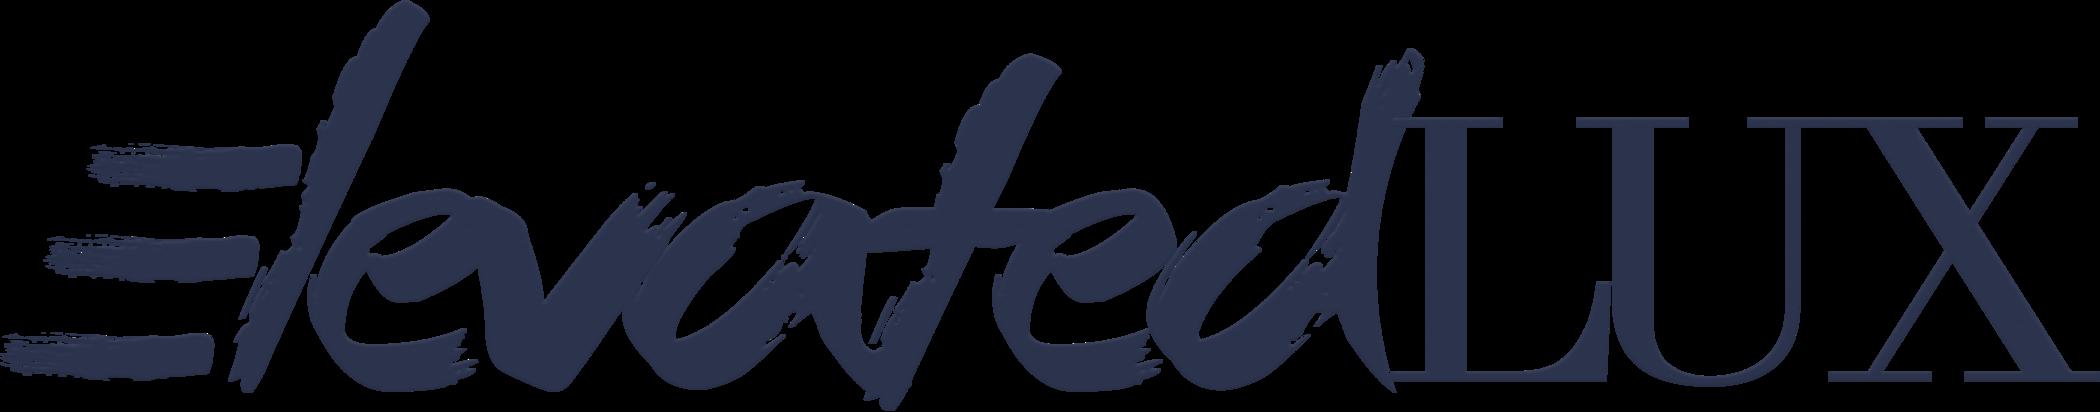 http://www.elevatedlux.com/wp-content/uploads/2021/04/logo_elevatedlux_longversion_blue-1.png